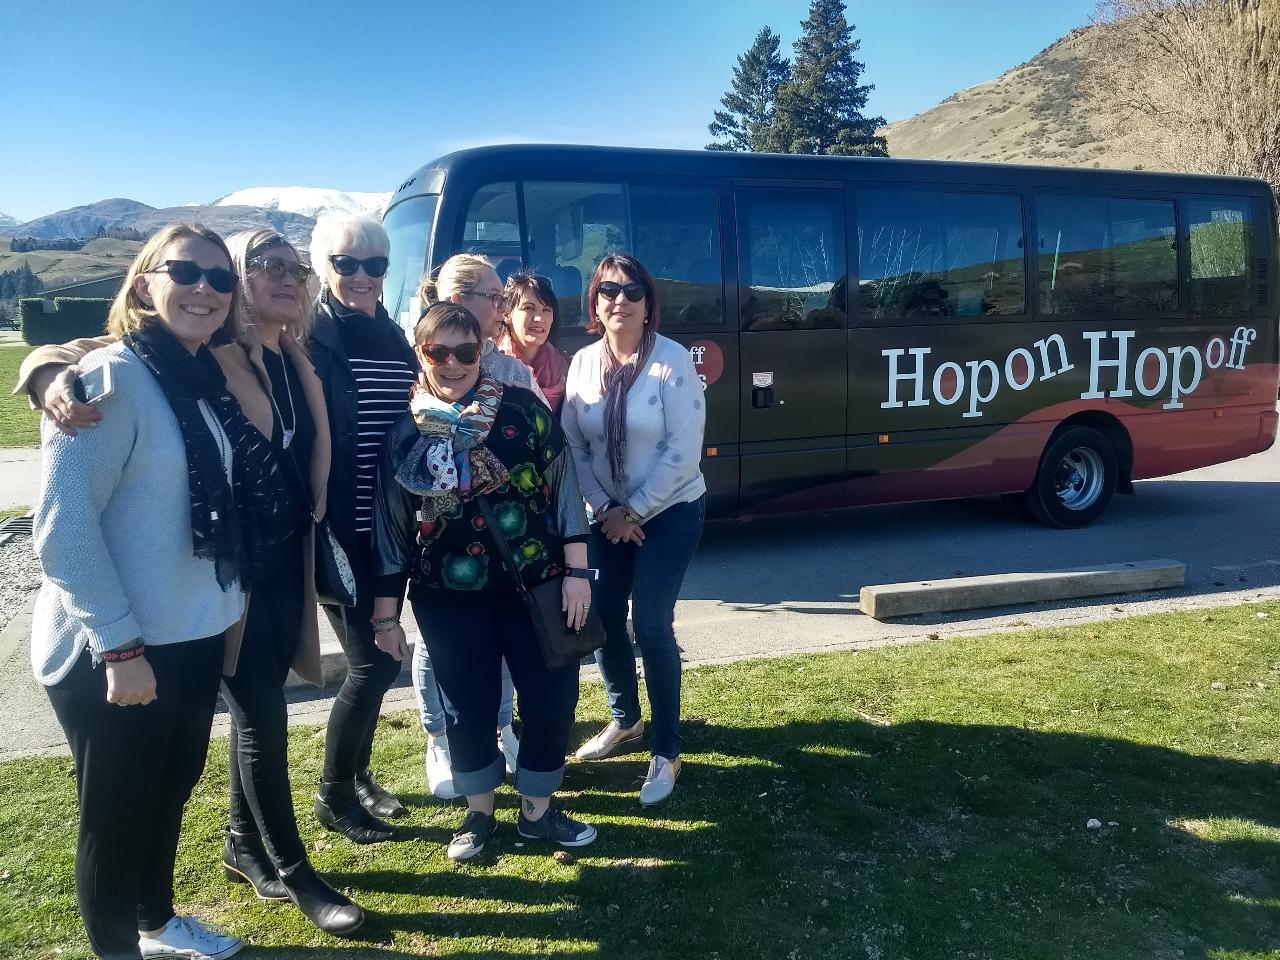 Hop on Hop off tours - Marlborough - Afternoon Tour (Departing Blenheim i-SITE)